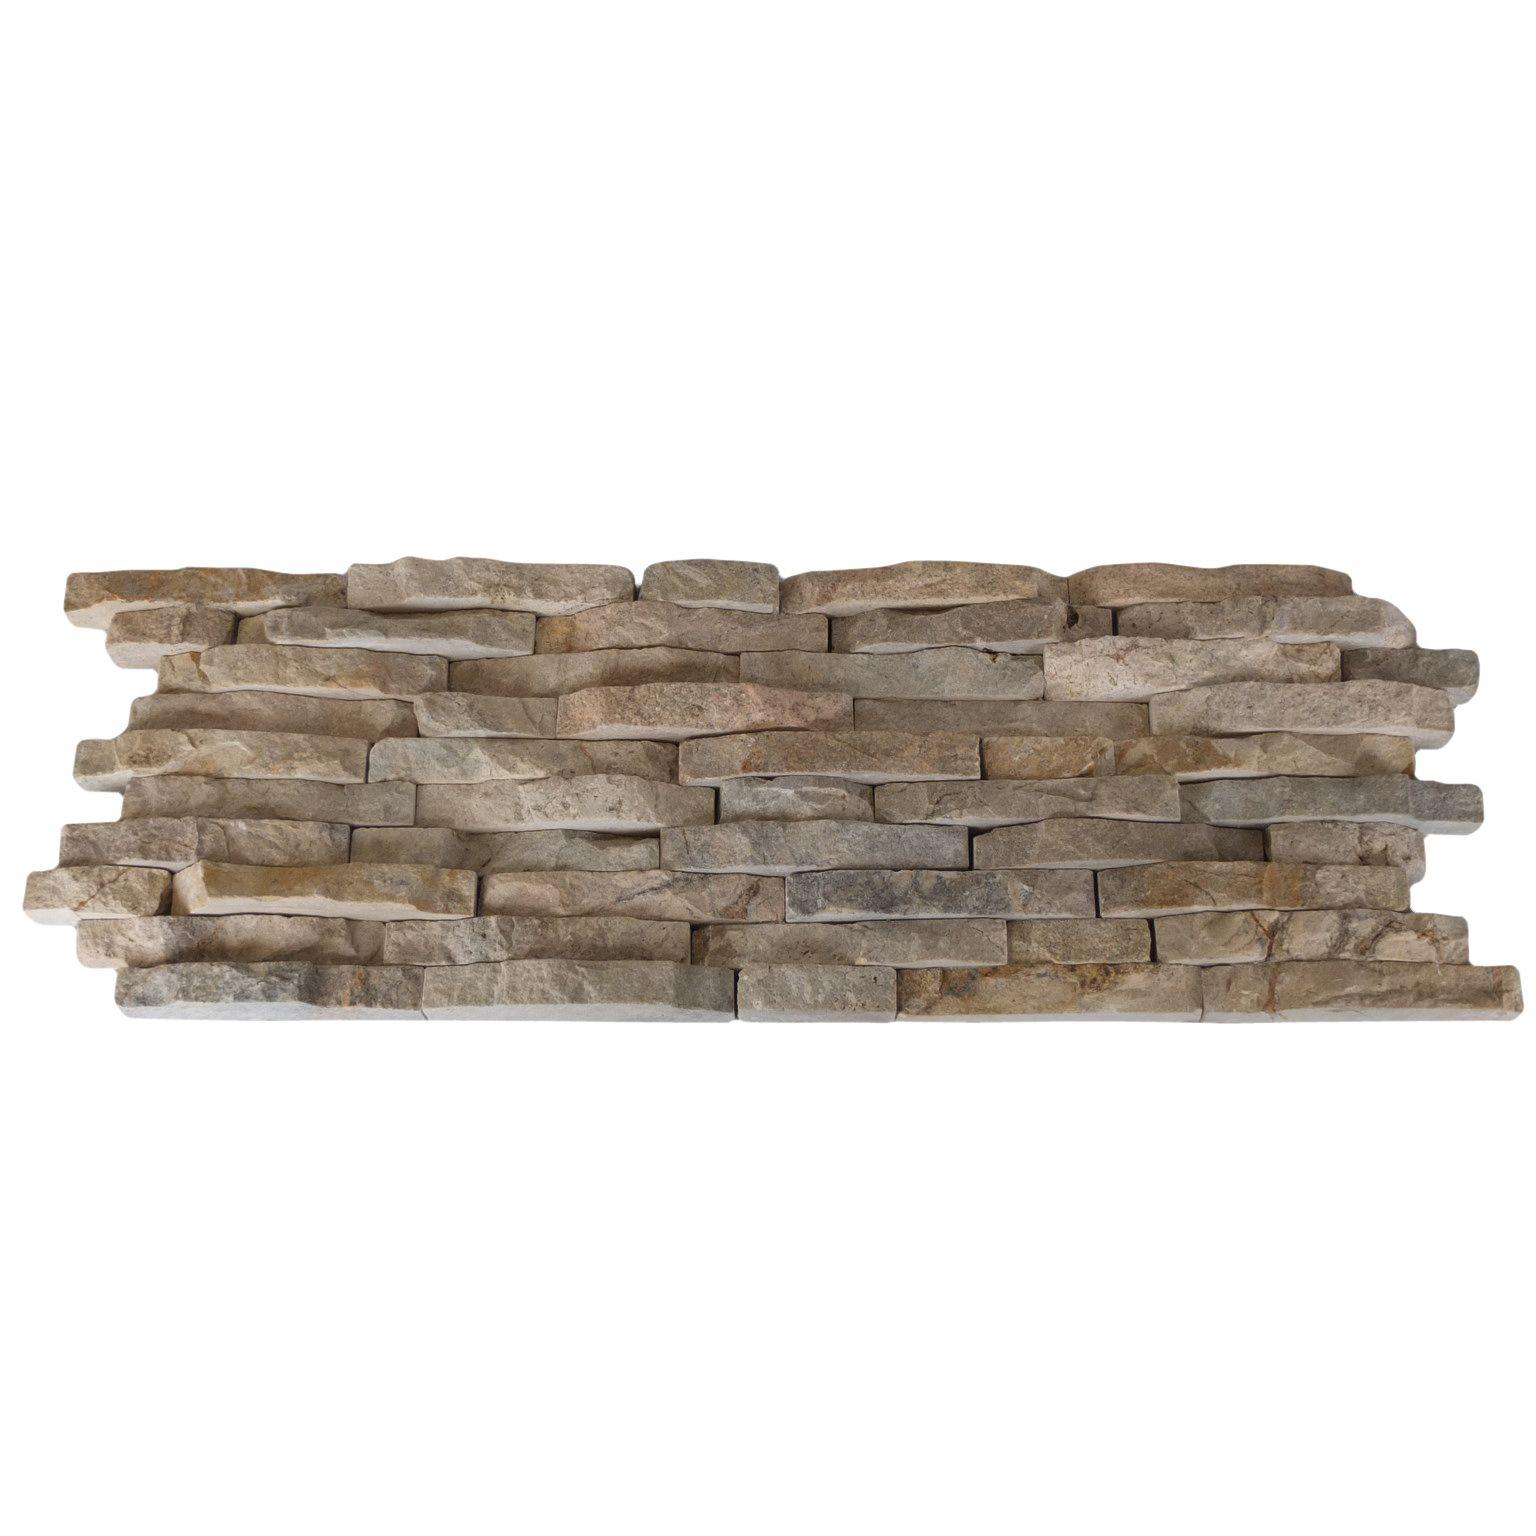 split face mini mosaic tile ledge stone beige. Black Bedroom Furniture Sets. Home Design Ideas